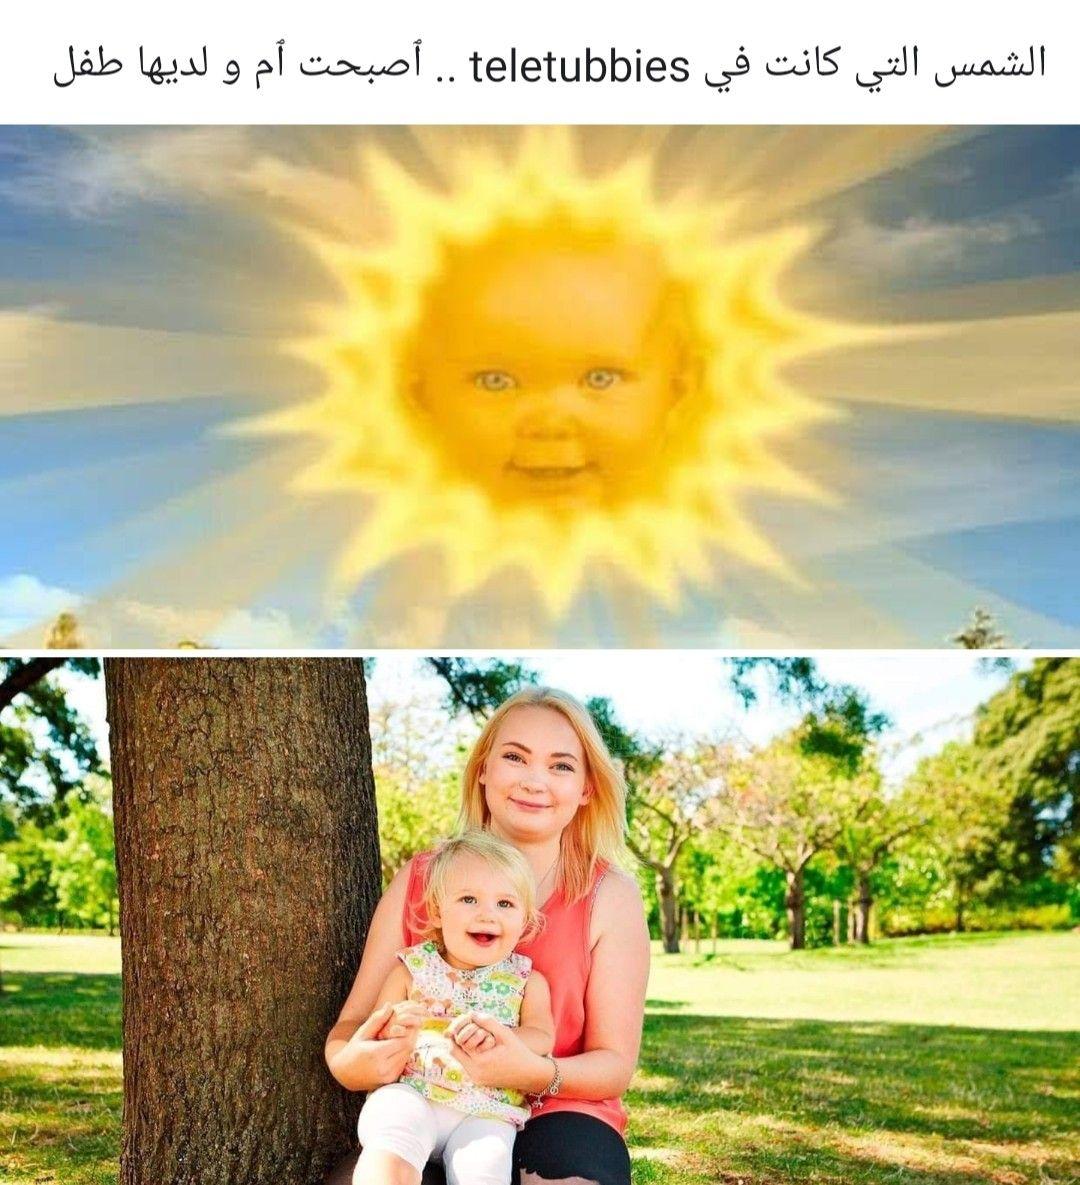 وانا عادني اغني معاهم Funny Photo Memes Iphone Wallpaper Quotes Love Arabic Funny